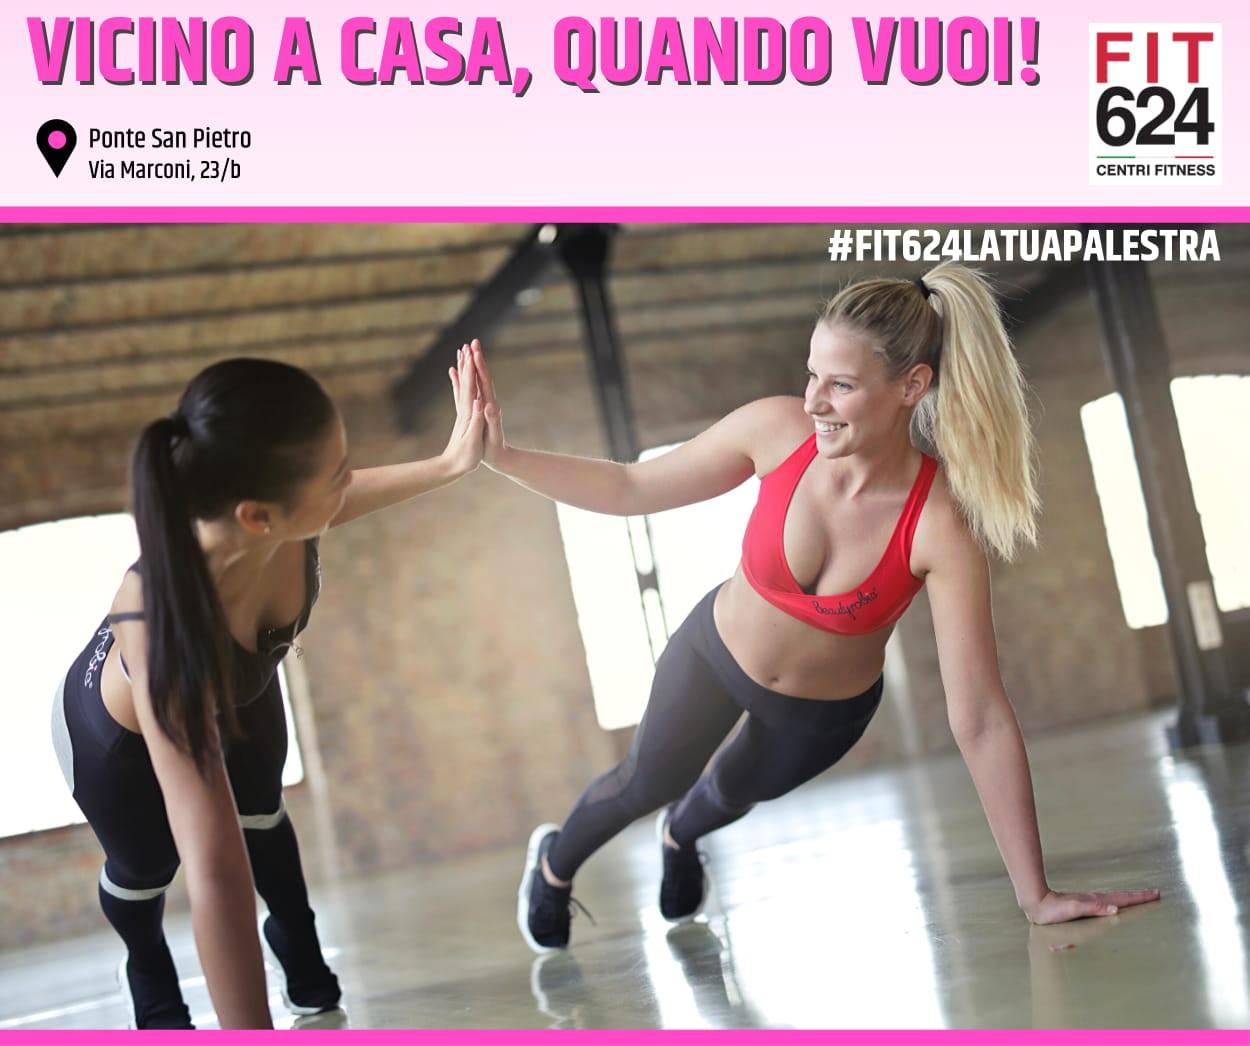 FIT624 Bergamo Promo Novembre 2019 Ponte San Pietro 2